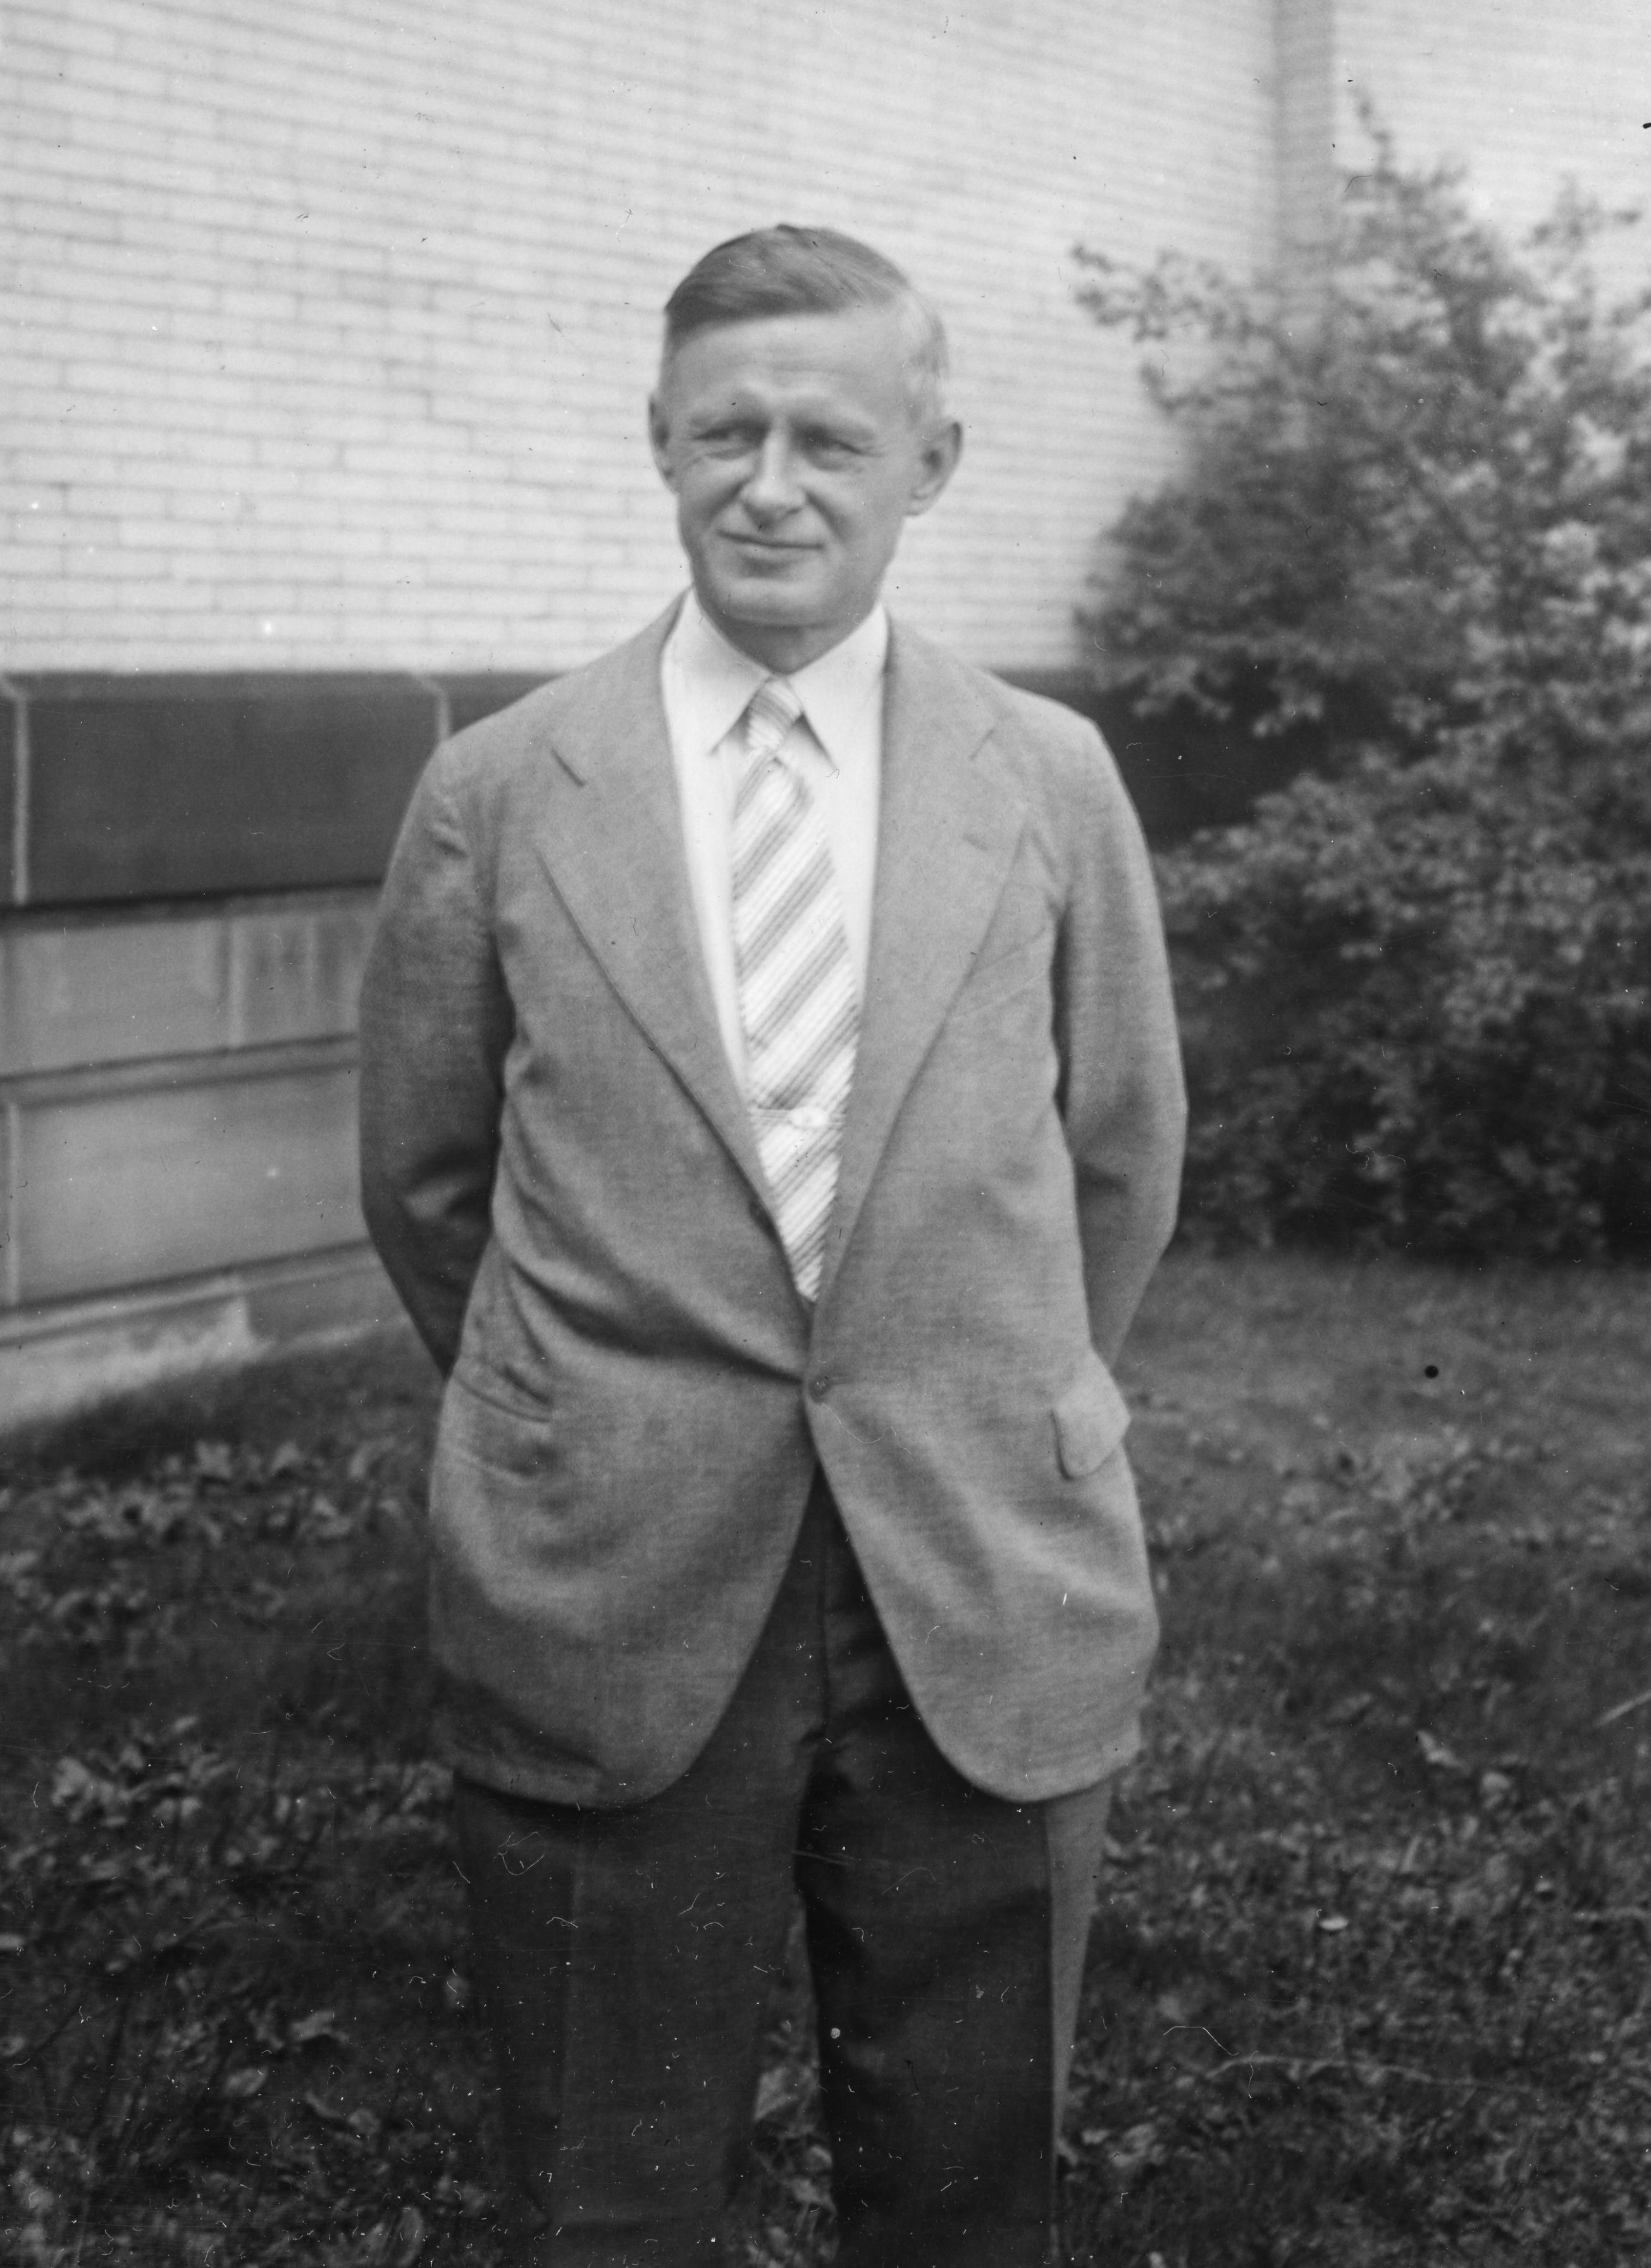 William F. Meggers home movies, 1927-1959